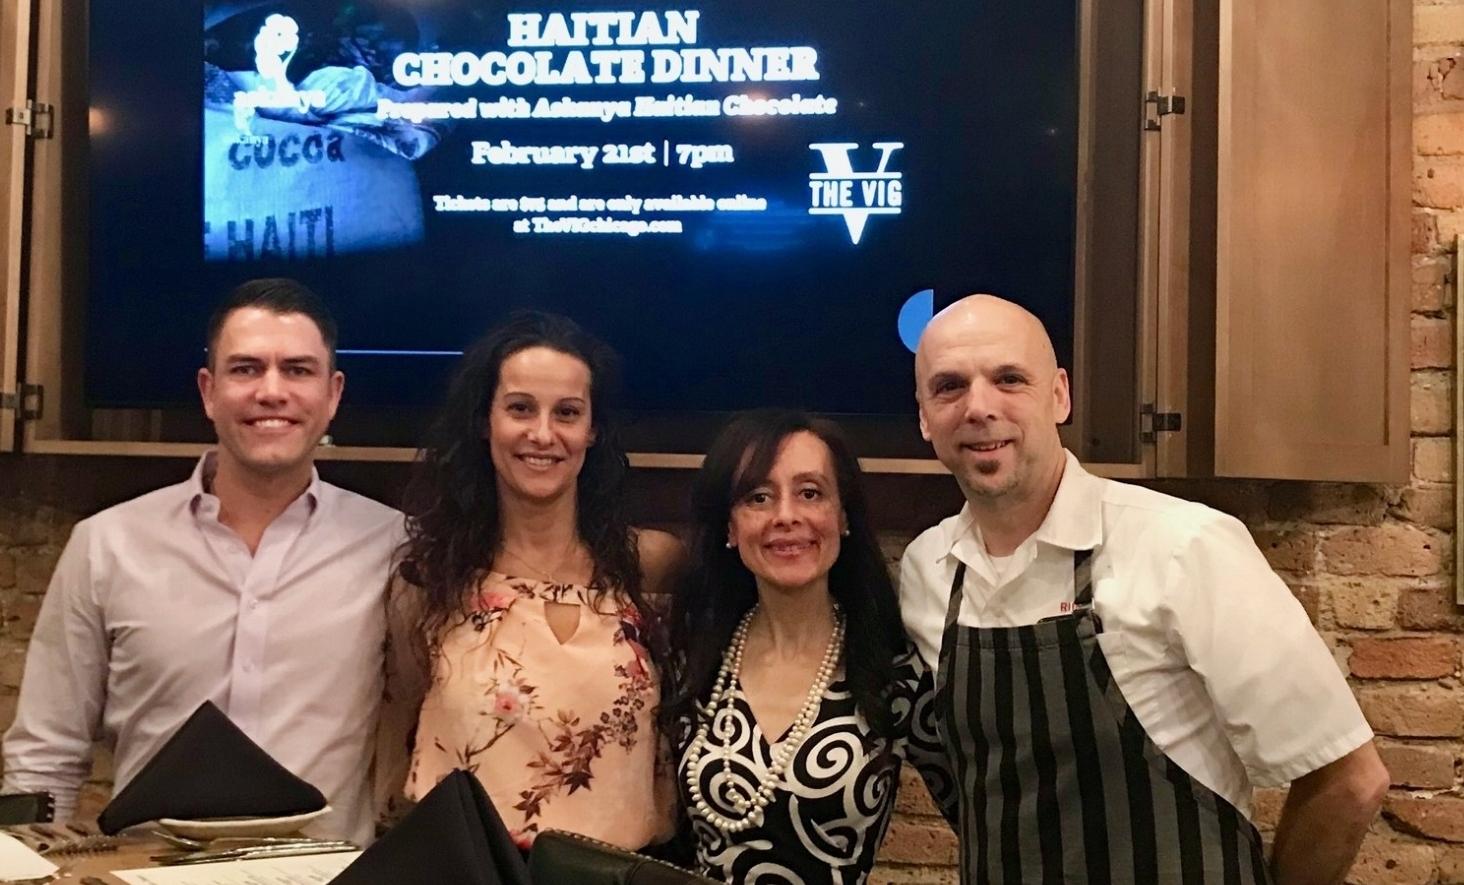 2018 Chicago Haitian Chocolate Dinner helping build schools in Haiti